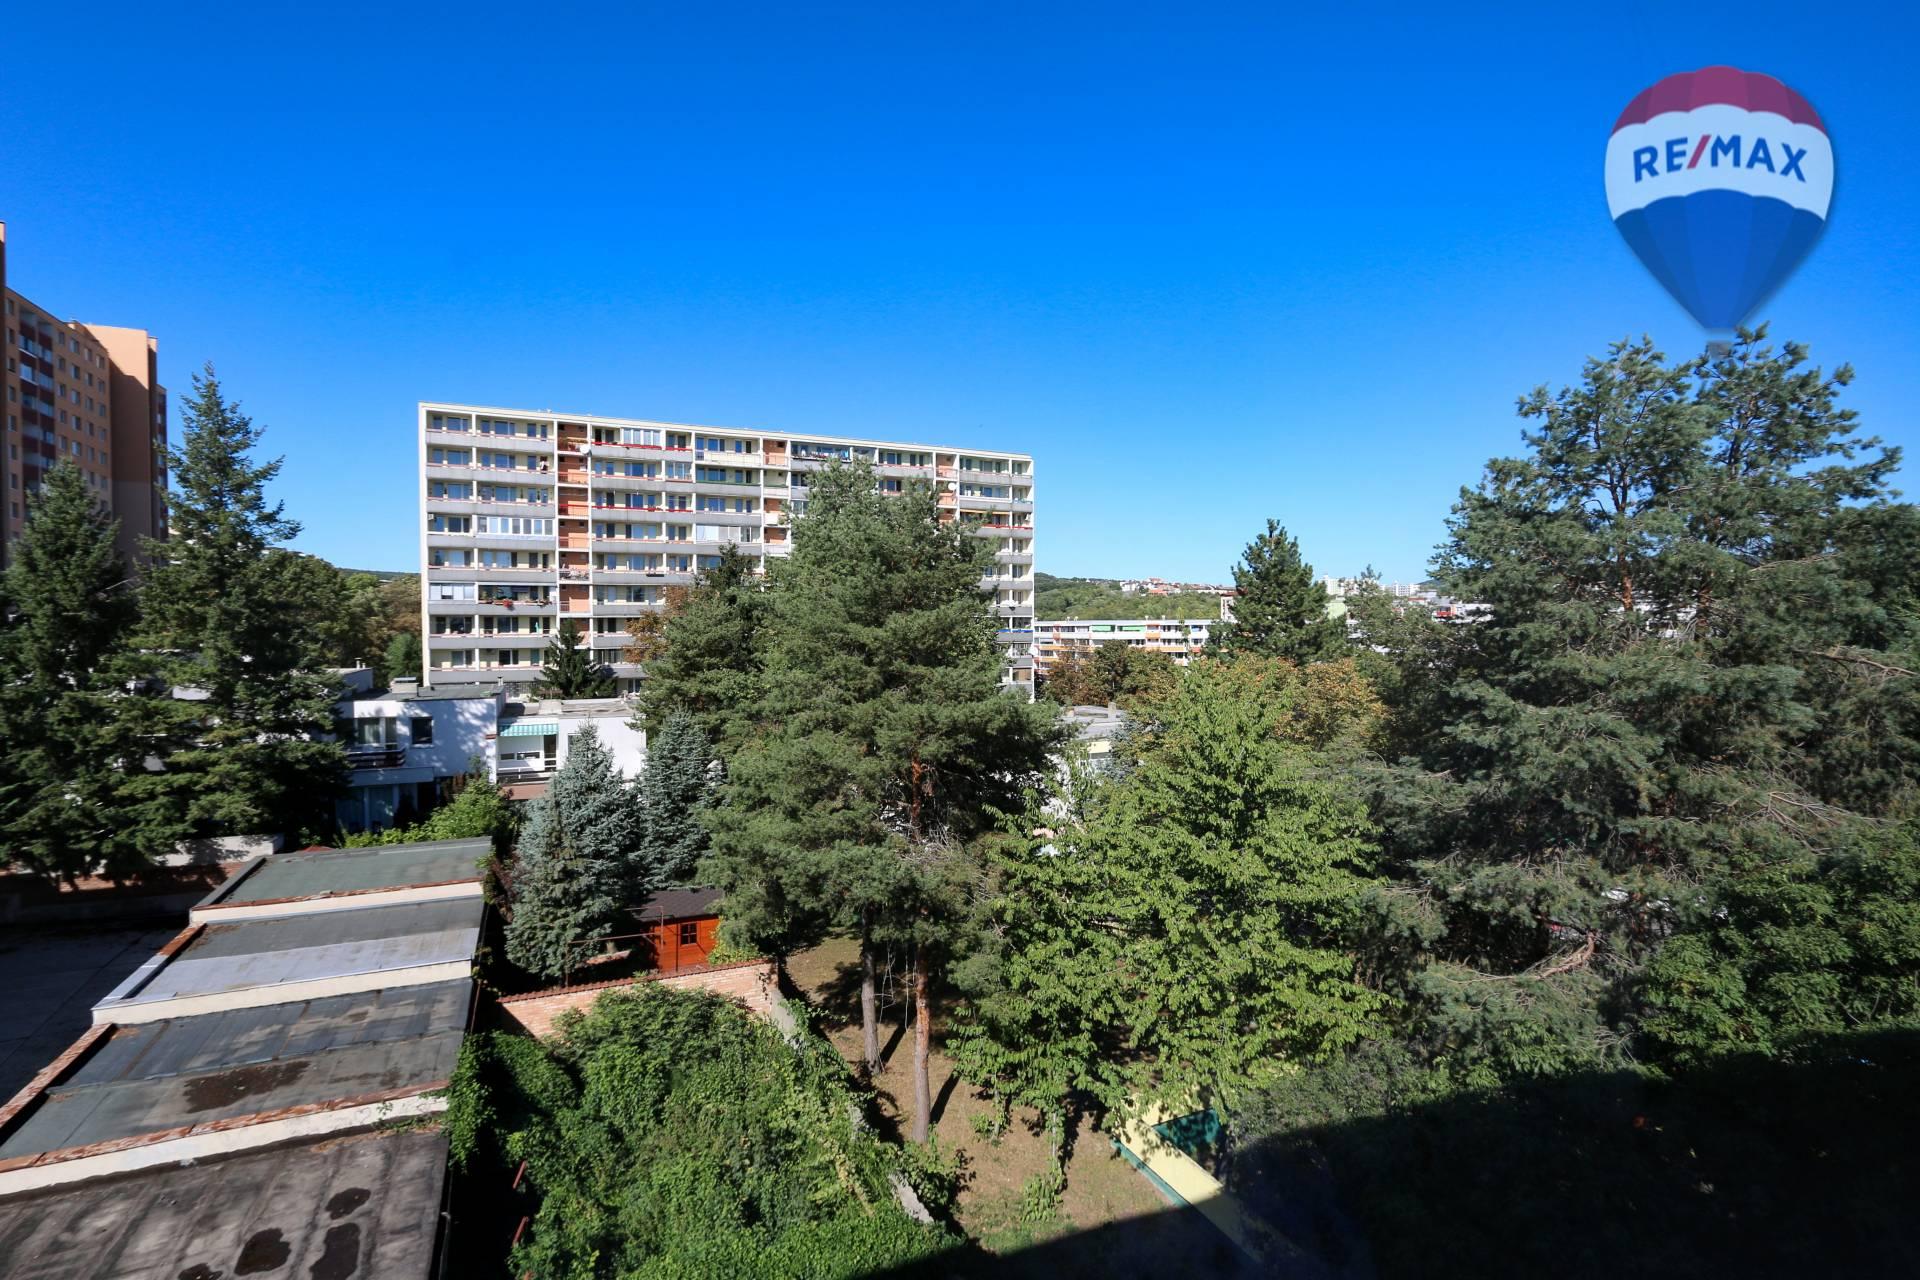 Predaj bytu (1 izbový) 32 m2, Bratislava - Karlova Ves - okolie